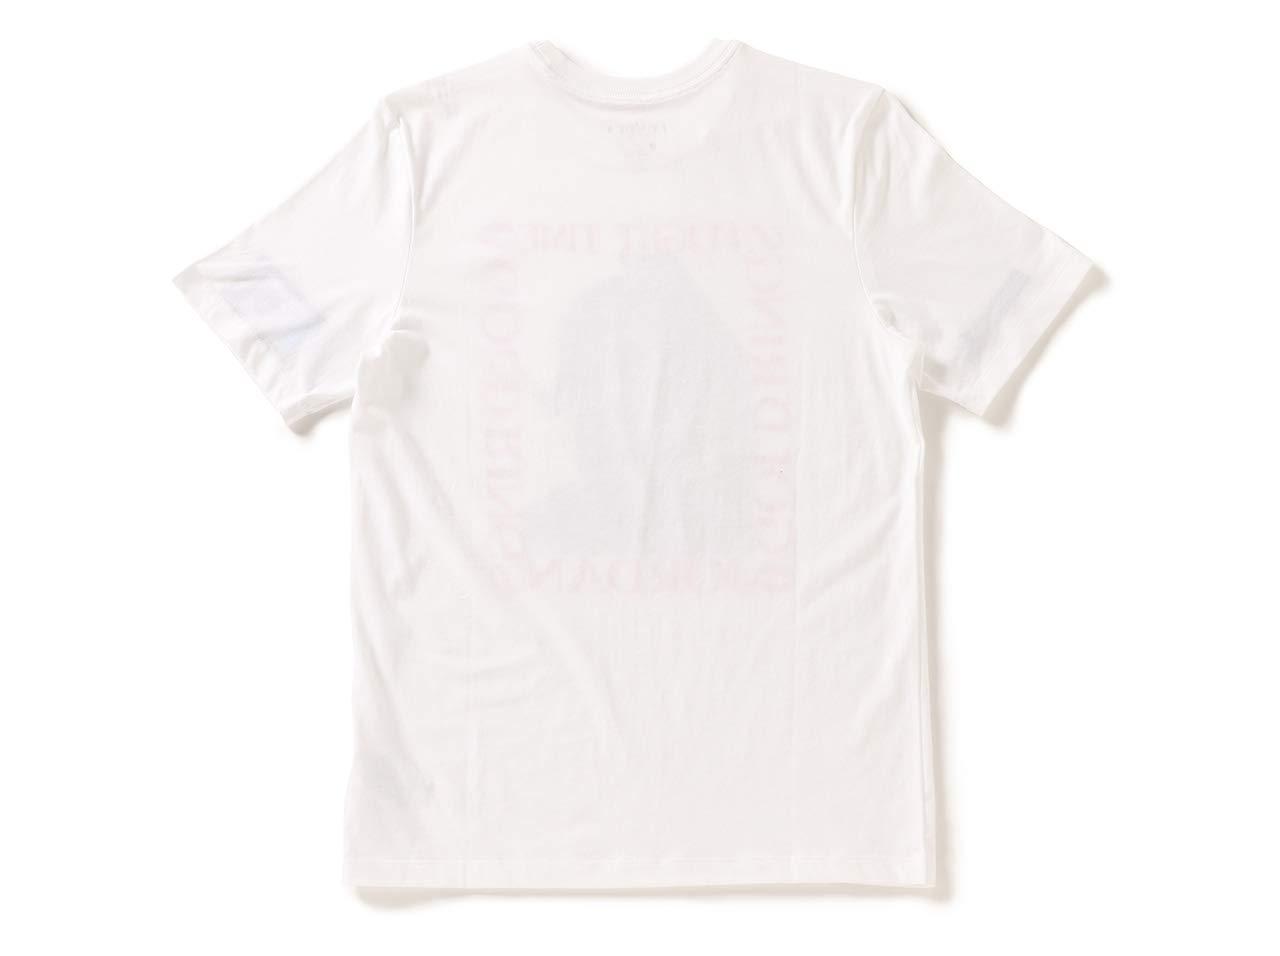 Nike Herren Mj Flight Time Tee T-Shirt B07M93M5ZW Spieltrikots Bevorzugte Bevorzugte Bevorzugte Boutique 9e19a5